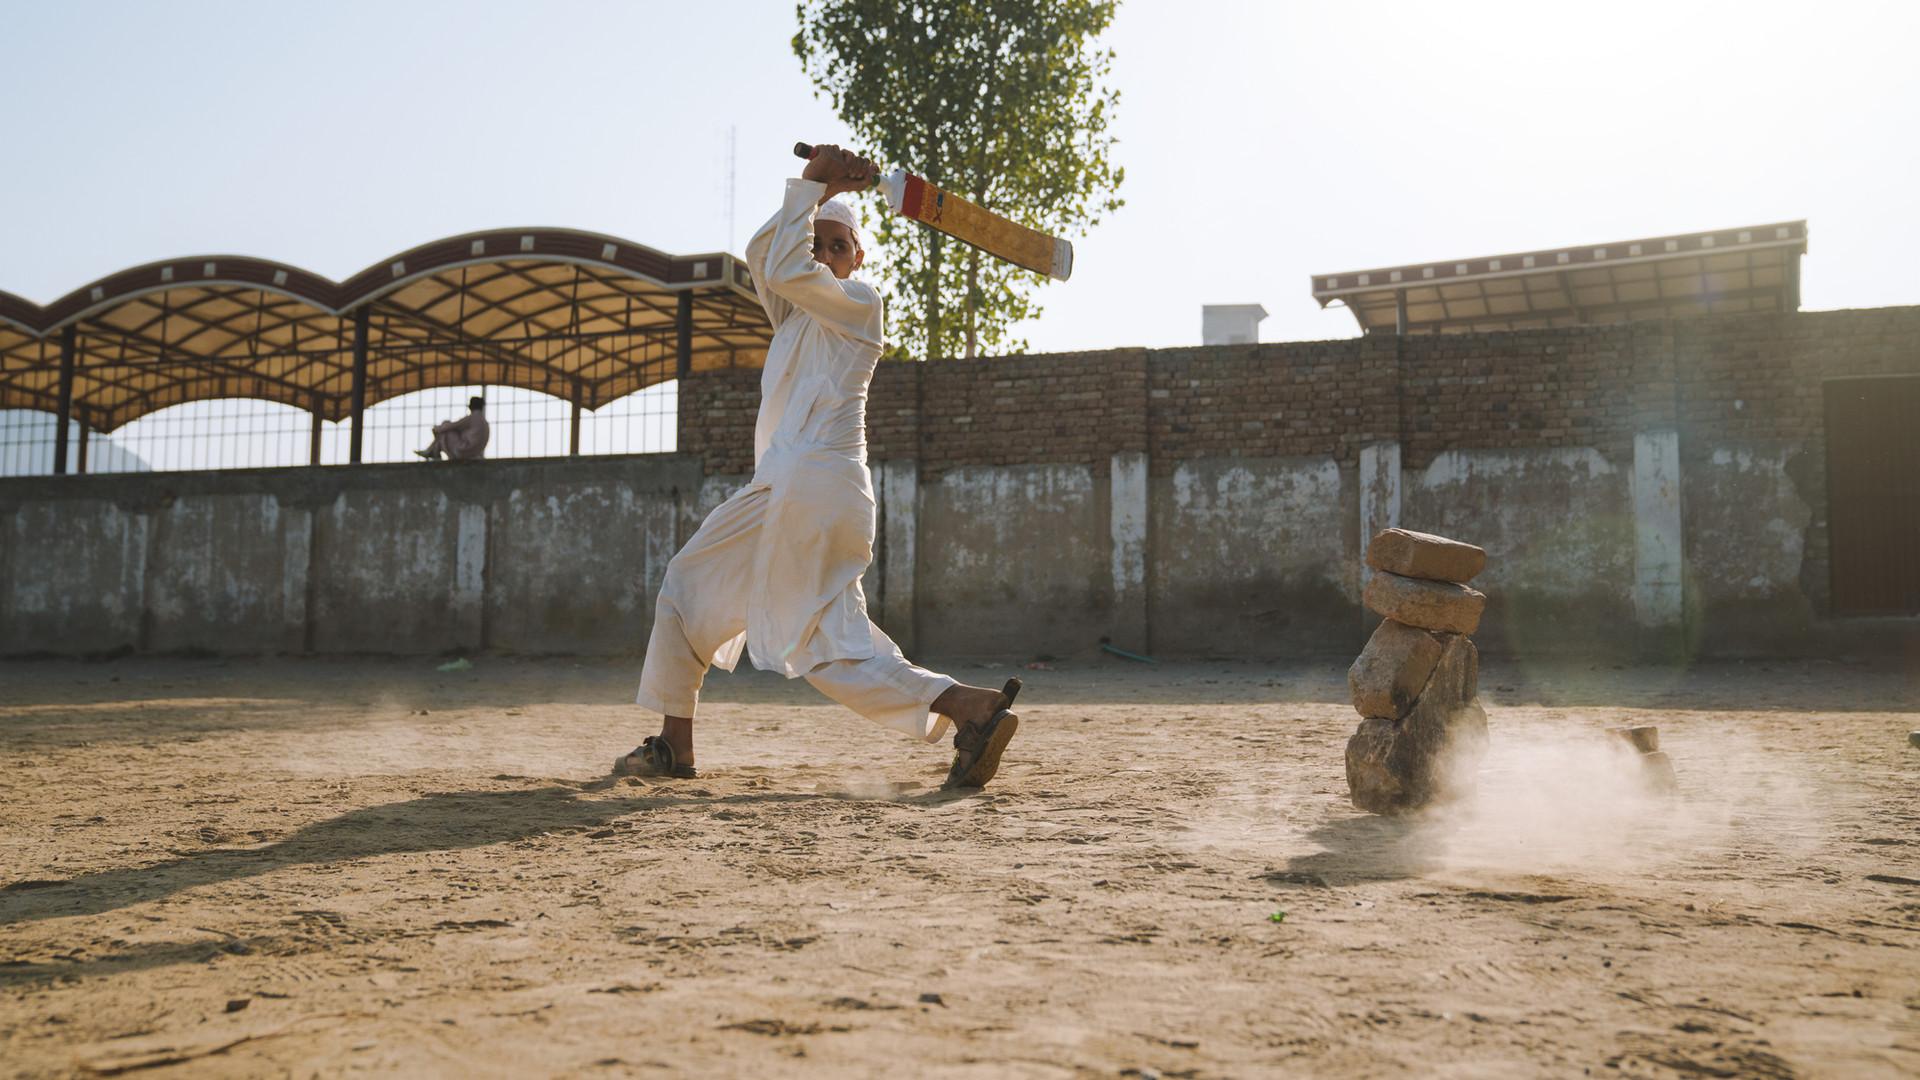 Pakistan--2.jpg